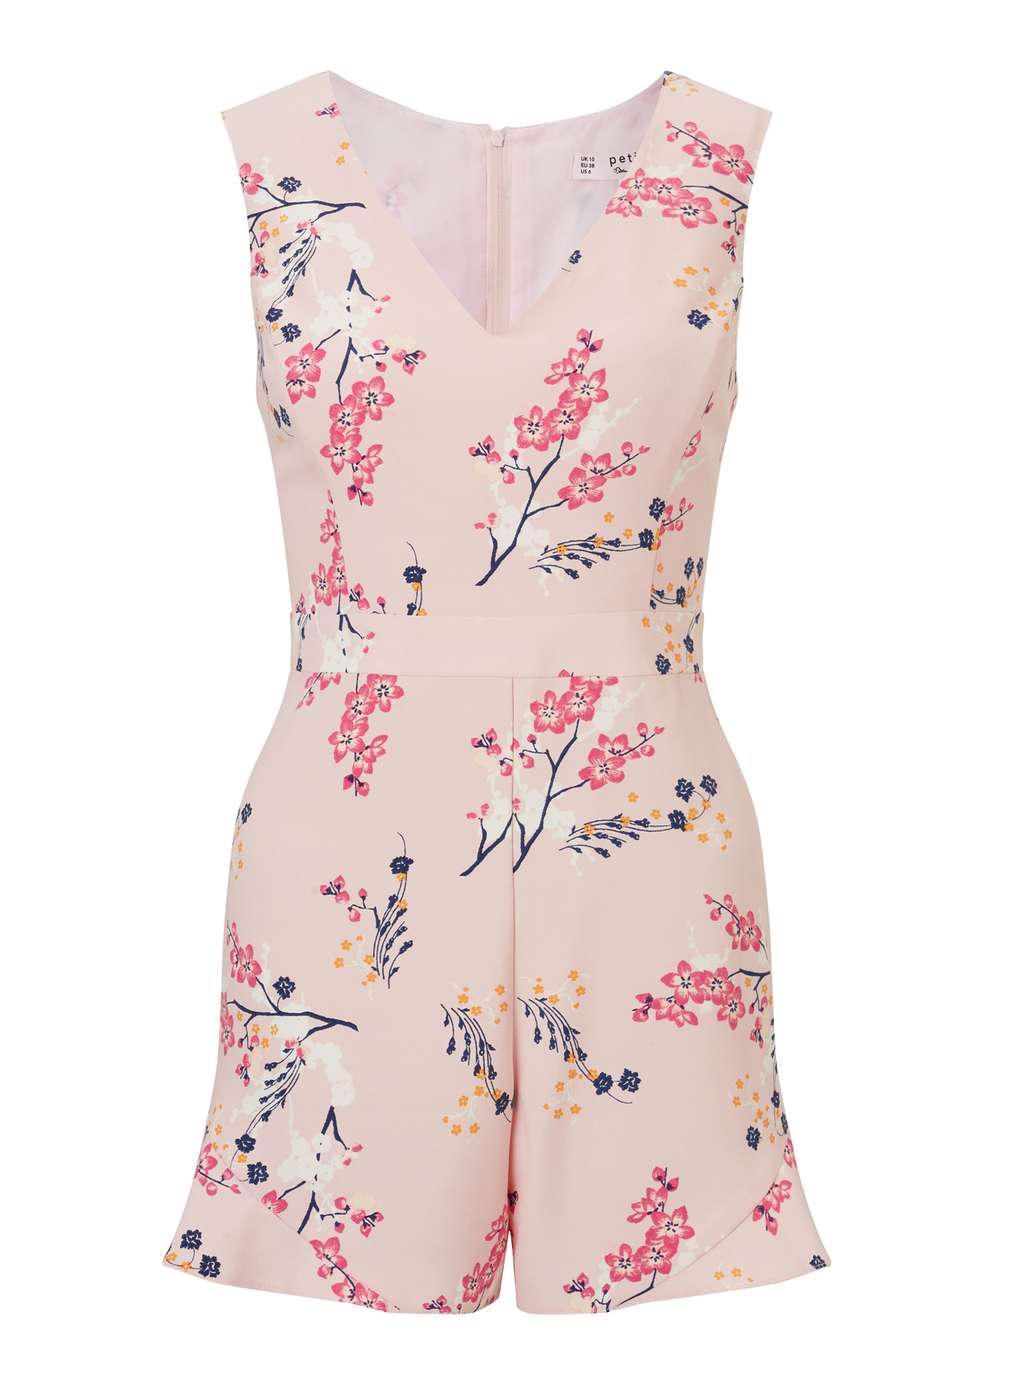 41f7954c88 Lyst - Miss Selfridge Petite Floral Print Ruffle Playsuit in Pink